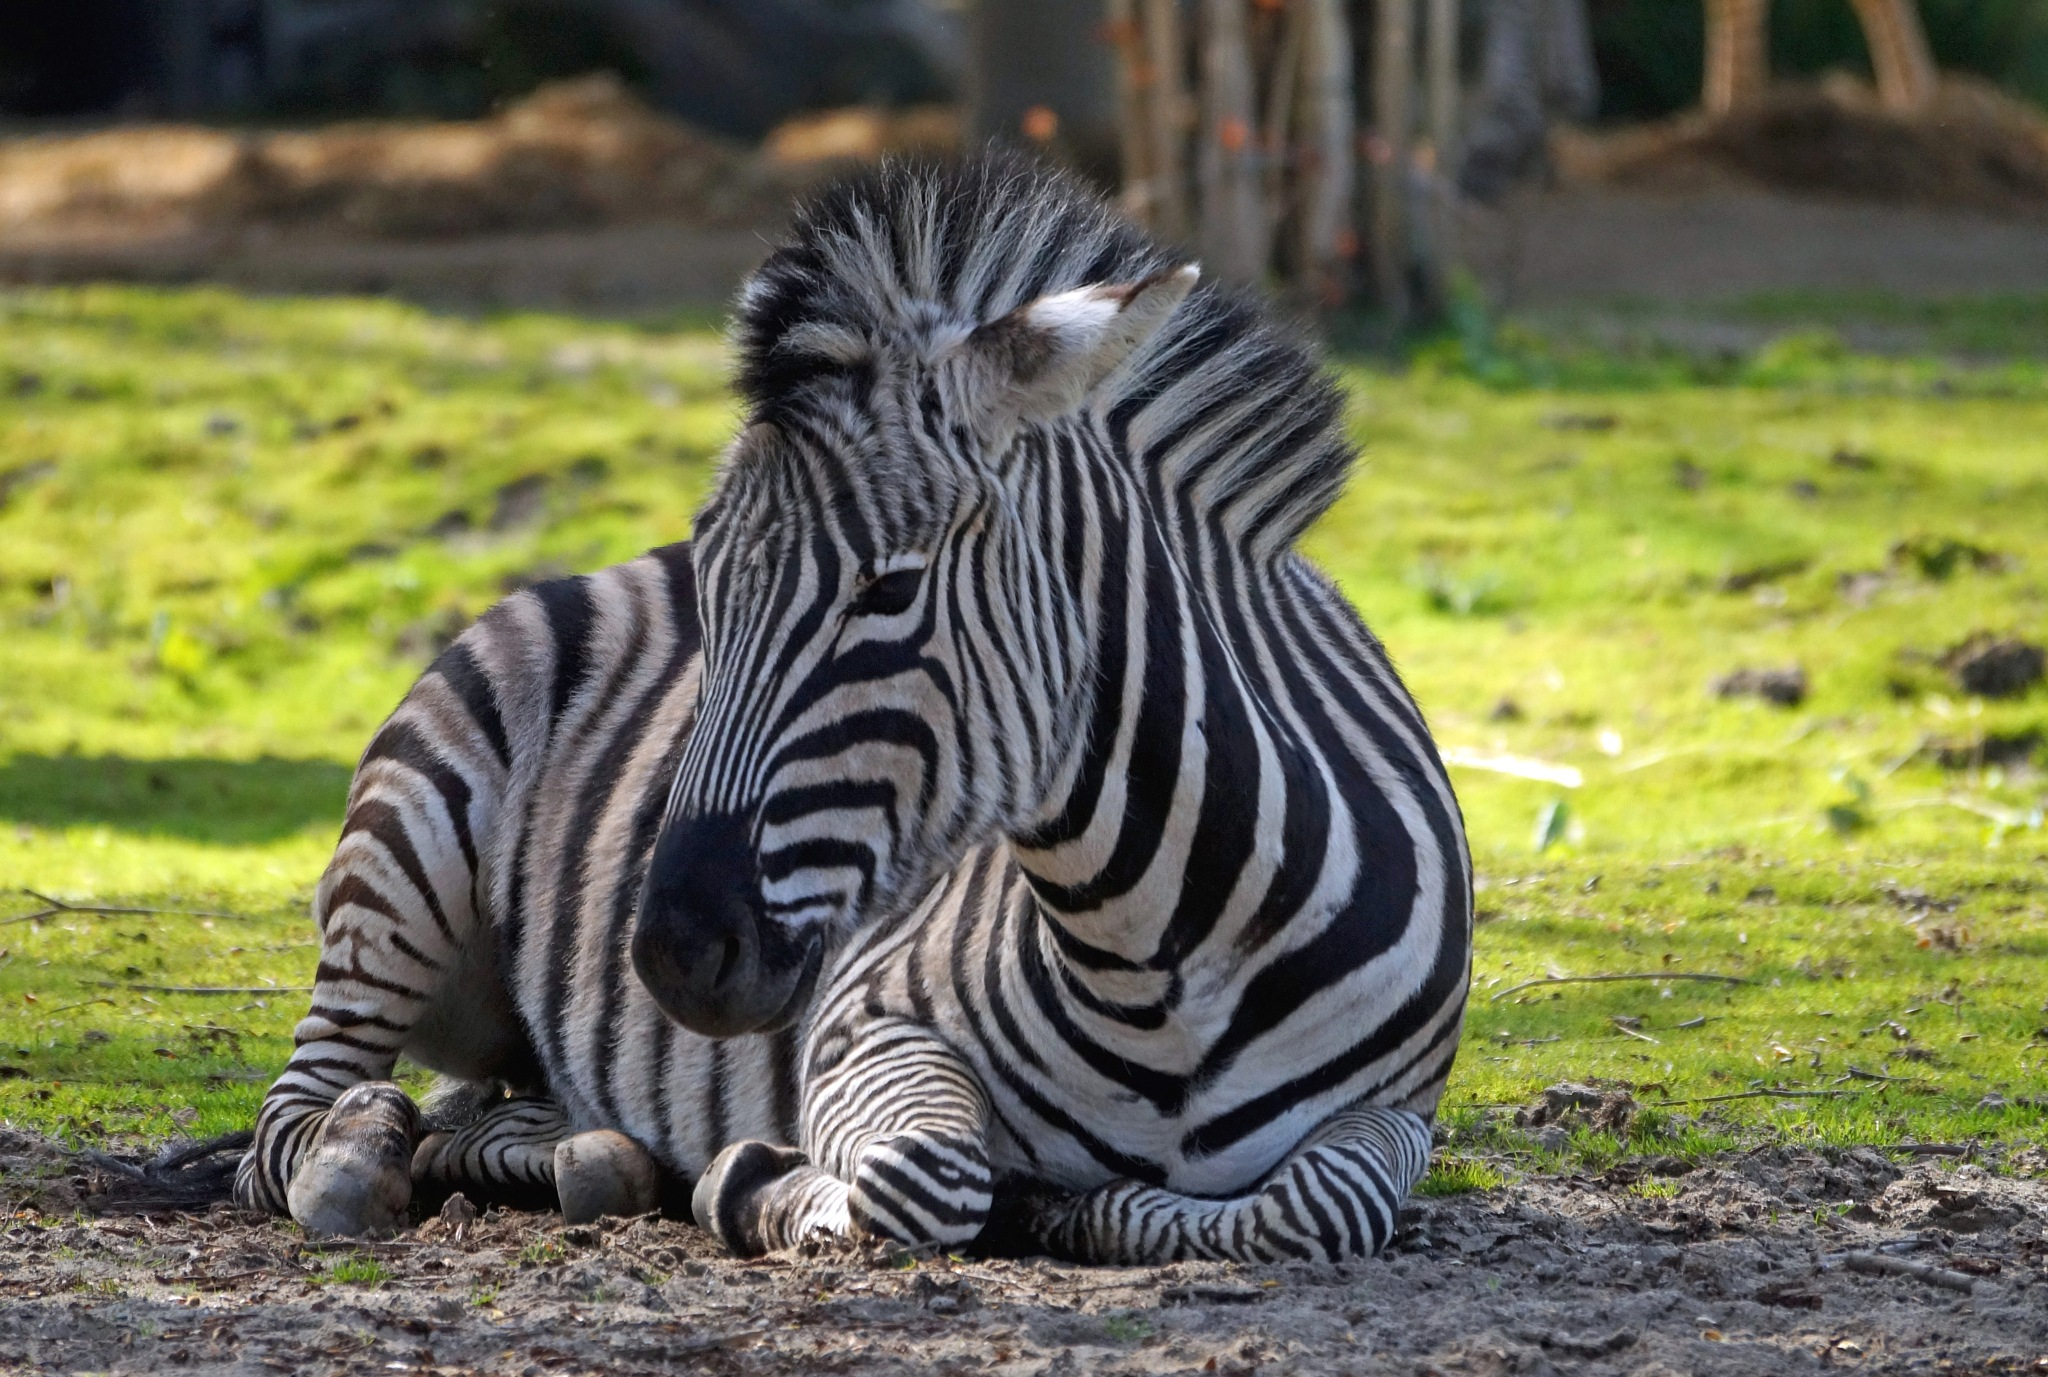 Zebra by Marian Baay